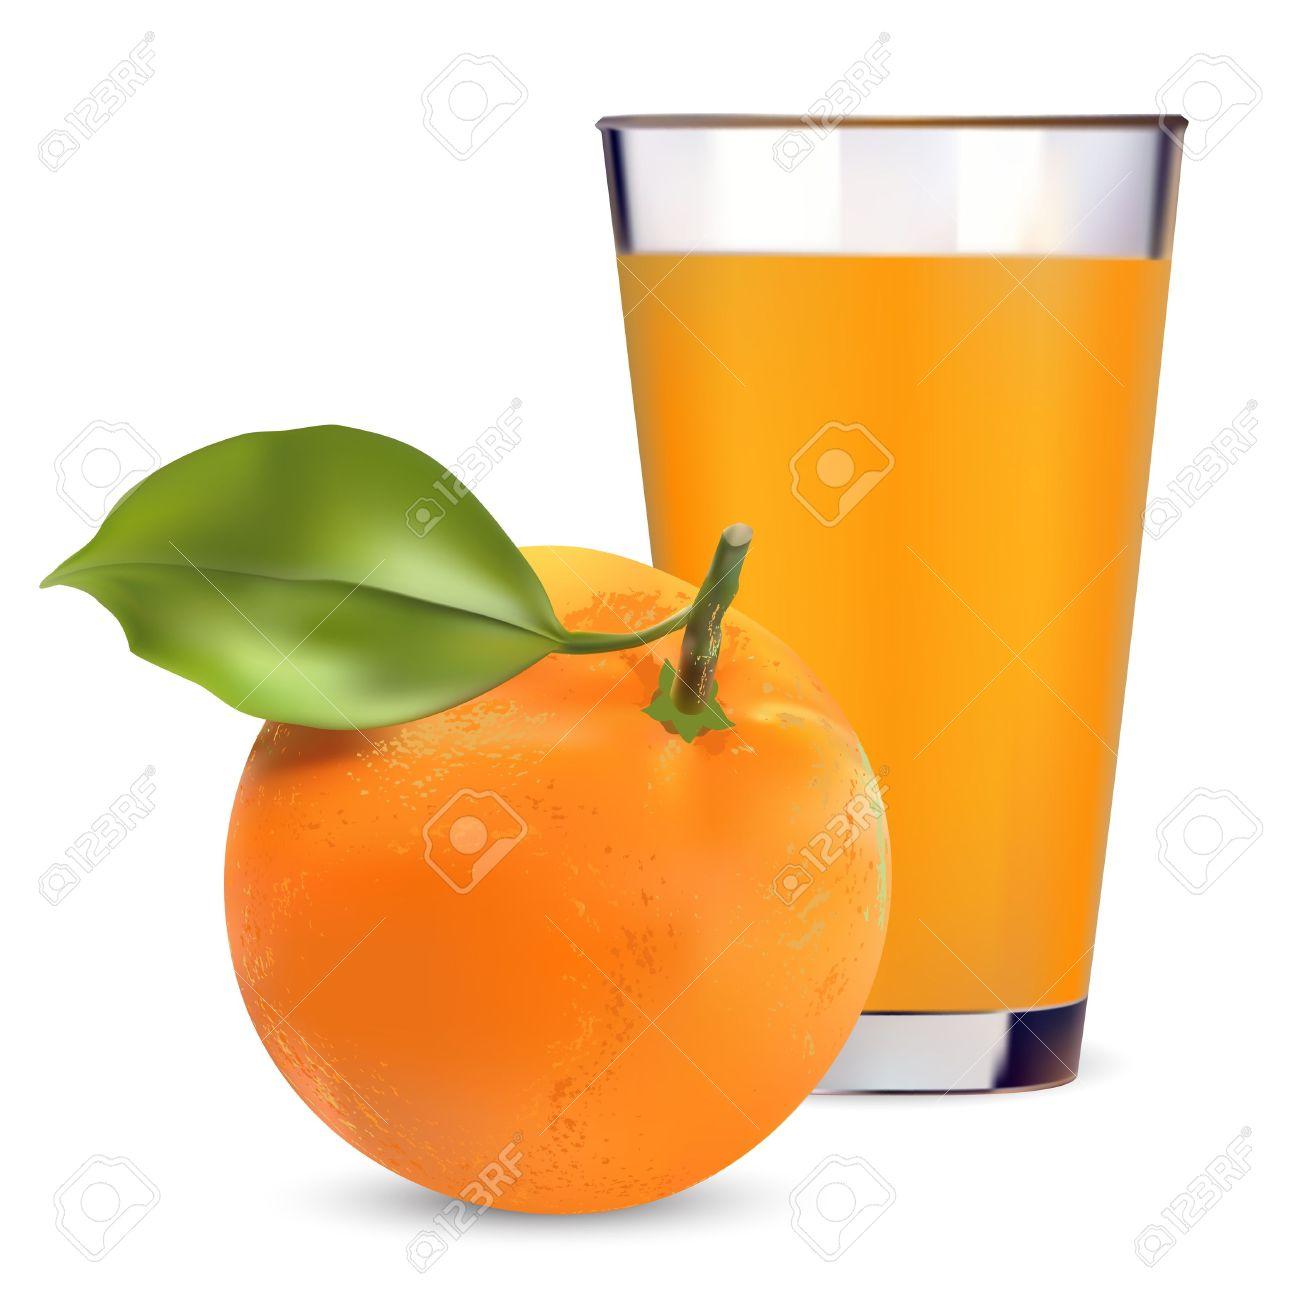 oranges and orange juice on .